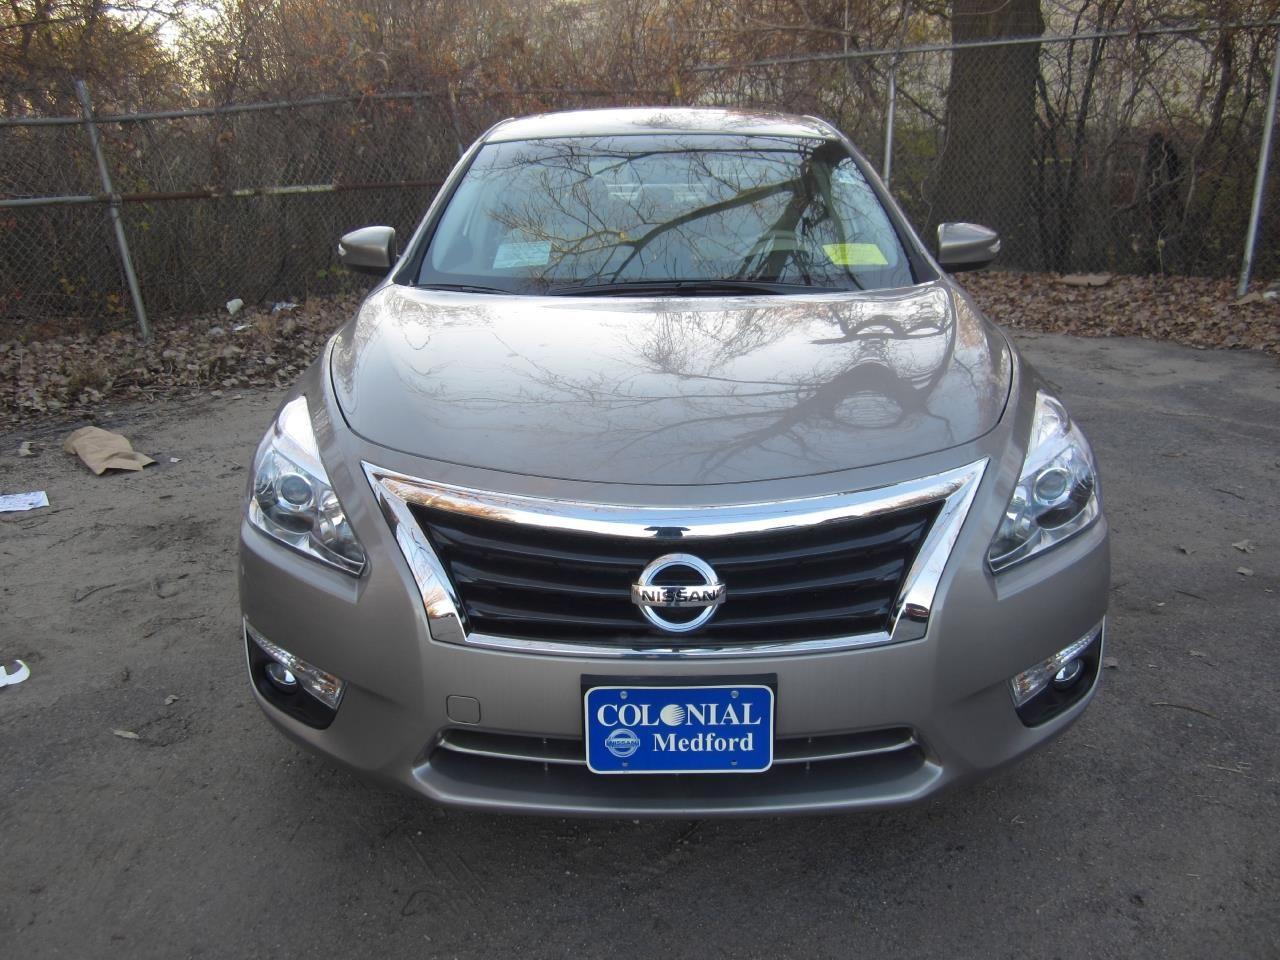 2013 Nissan Altima 3.5S 3.5 S 4dr Sedan Sedan 4 Doors Gray